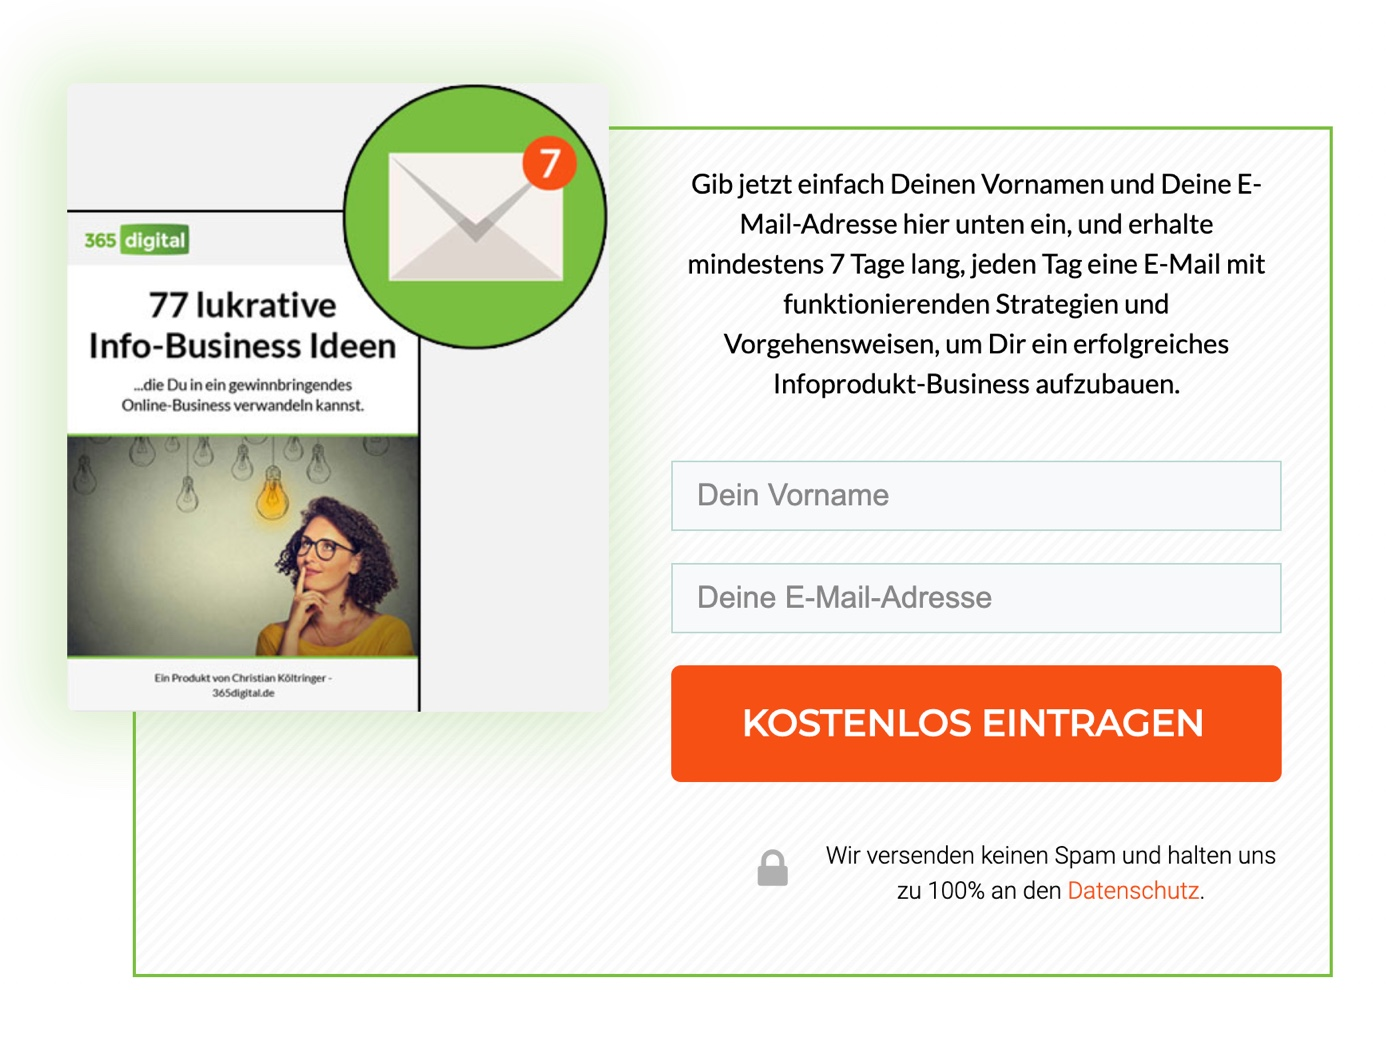 E-Mail-Anmeldeformular